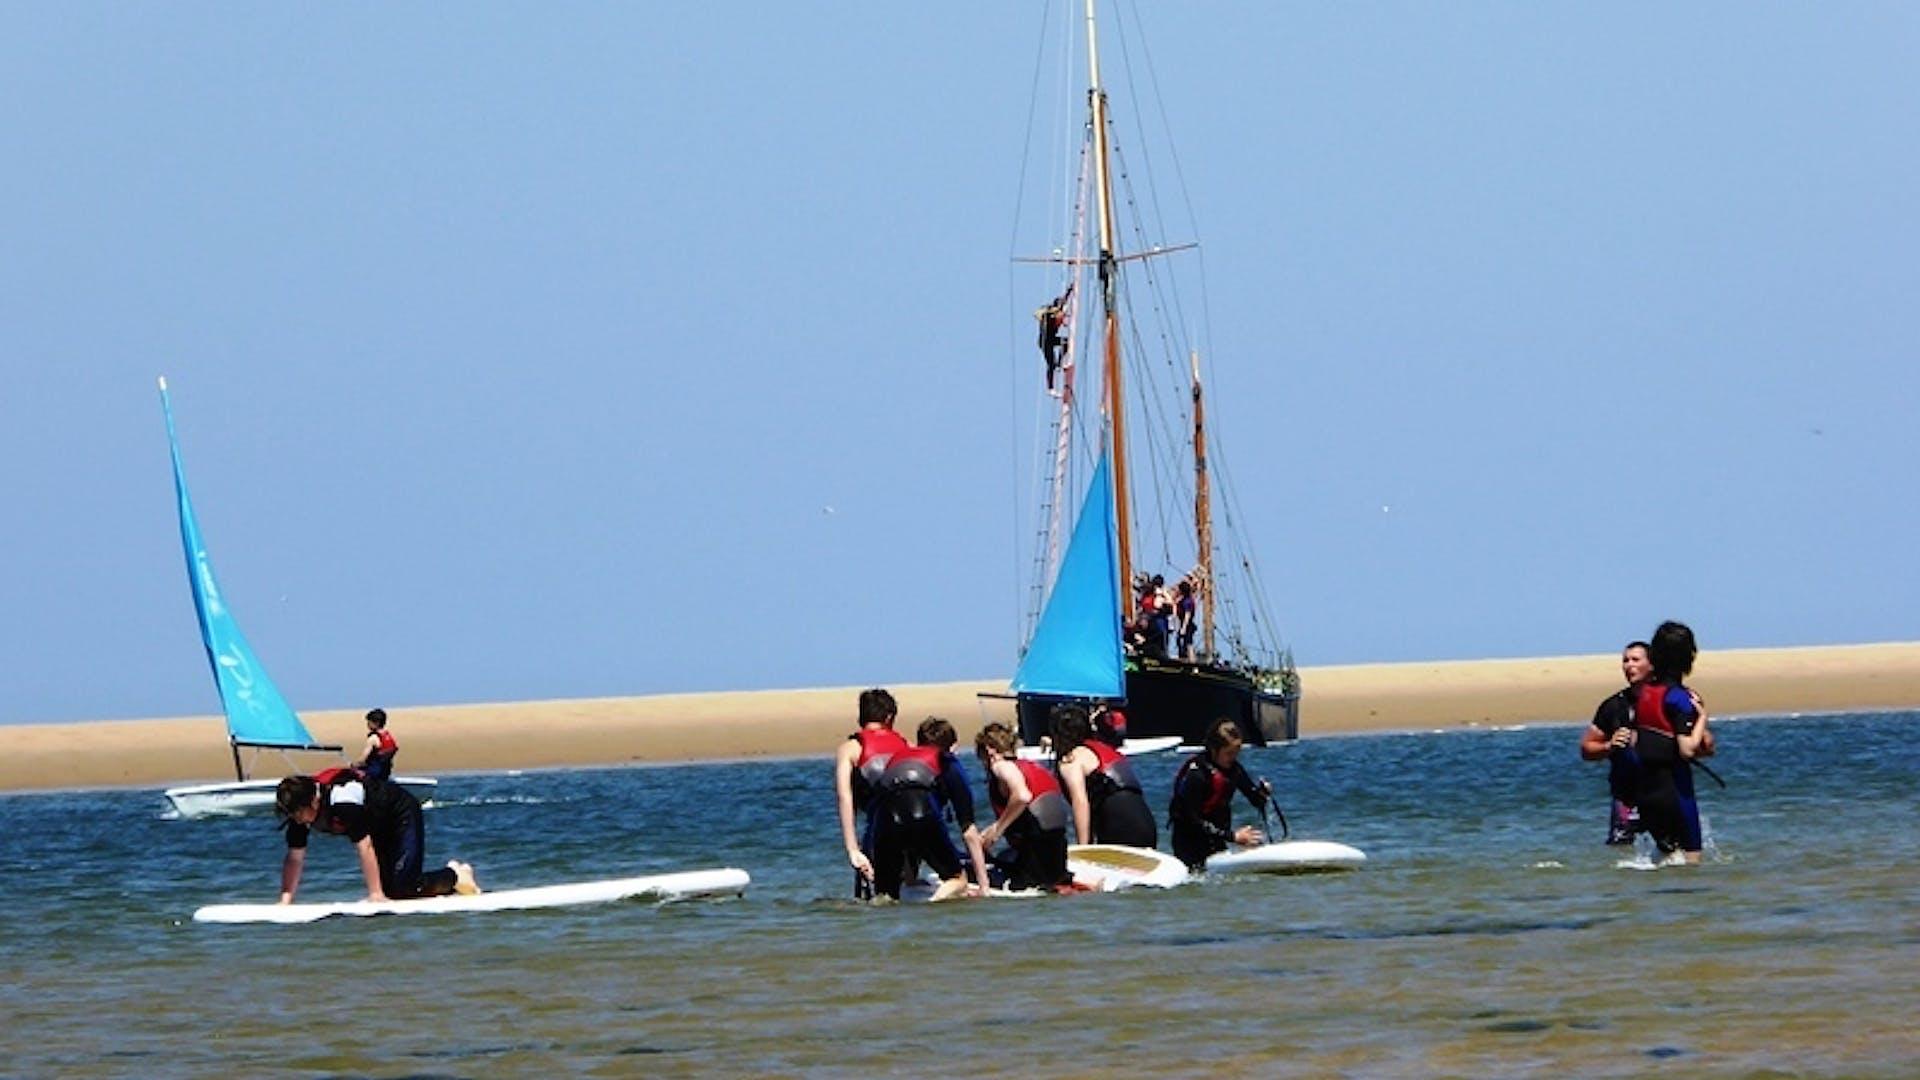 Capt C Scoles SSI 1 Taken at Blakeney Pit North Norfolk during RN camp caption A life on the Ocean waves 1